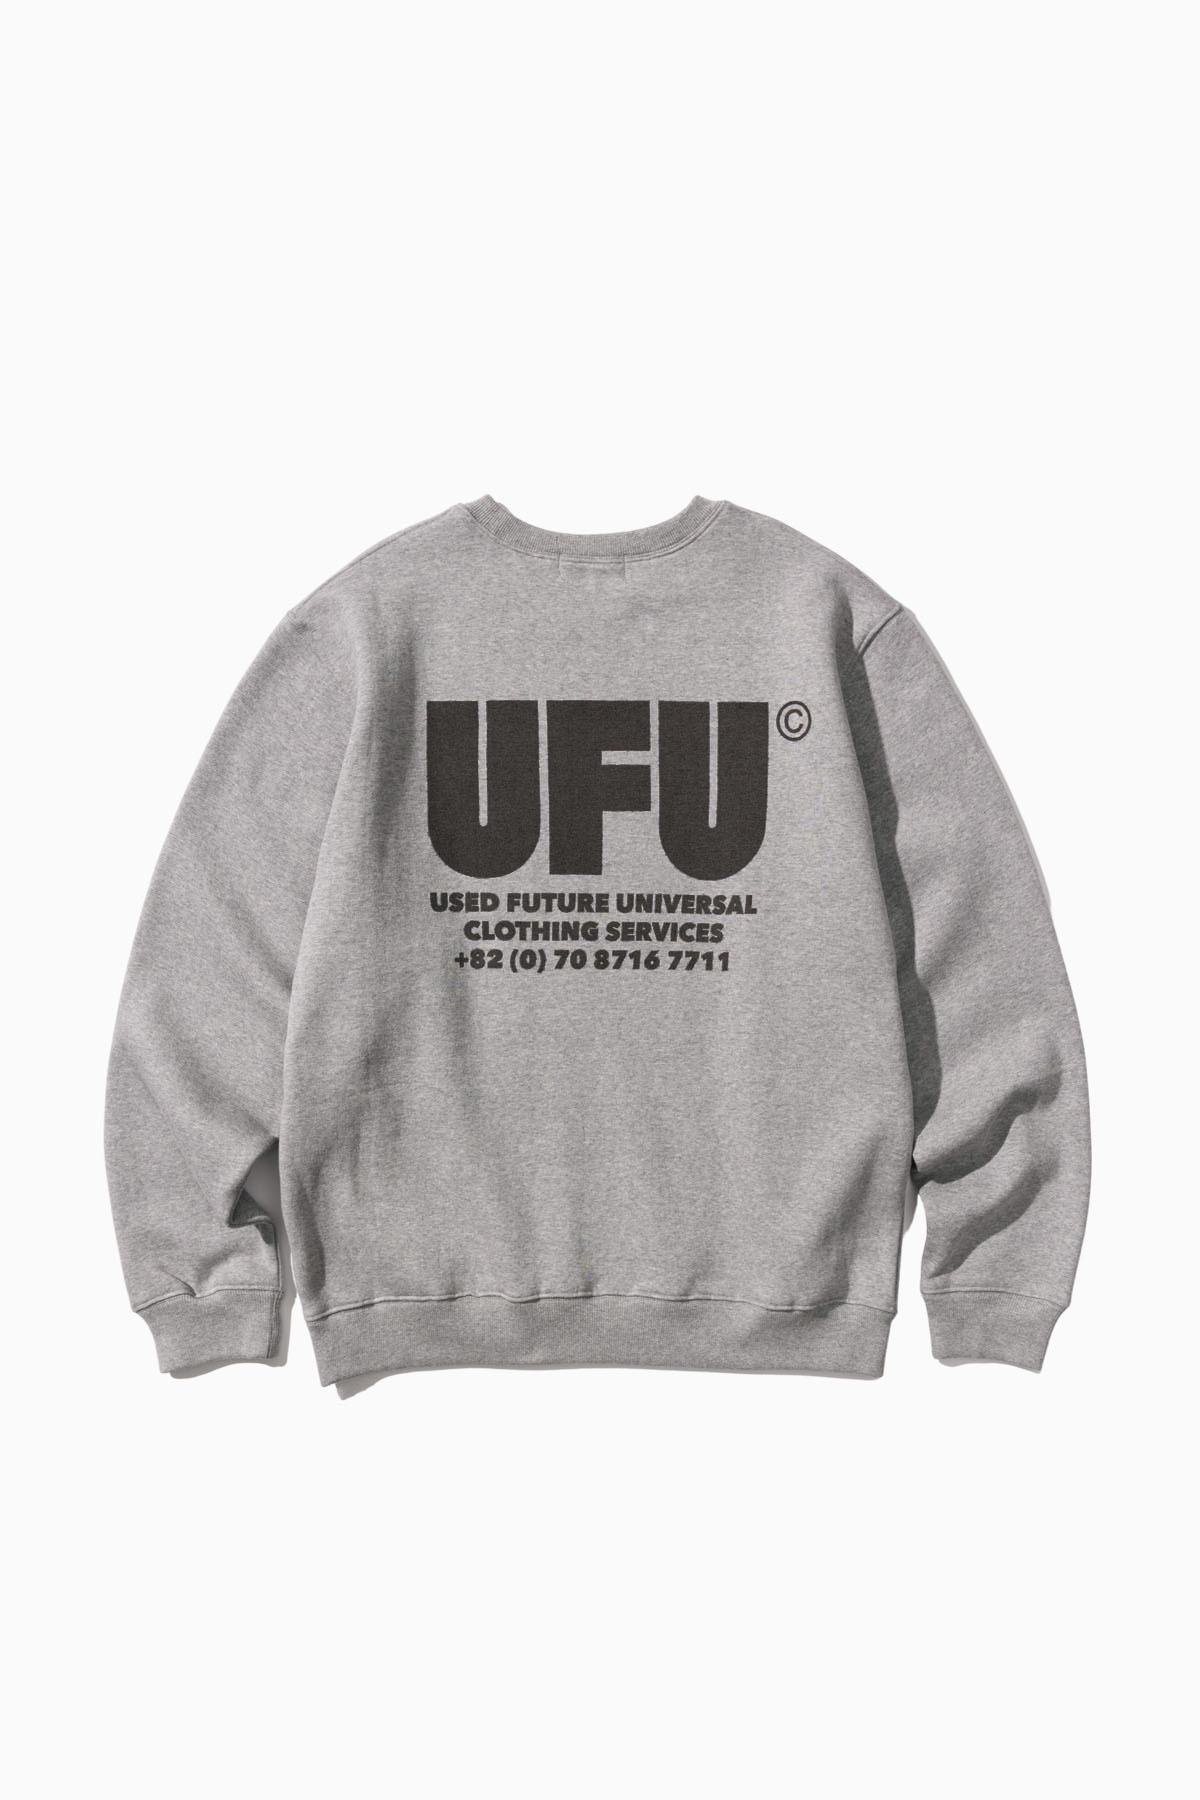 UFU AD CREWNECK_GREY